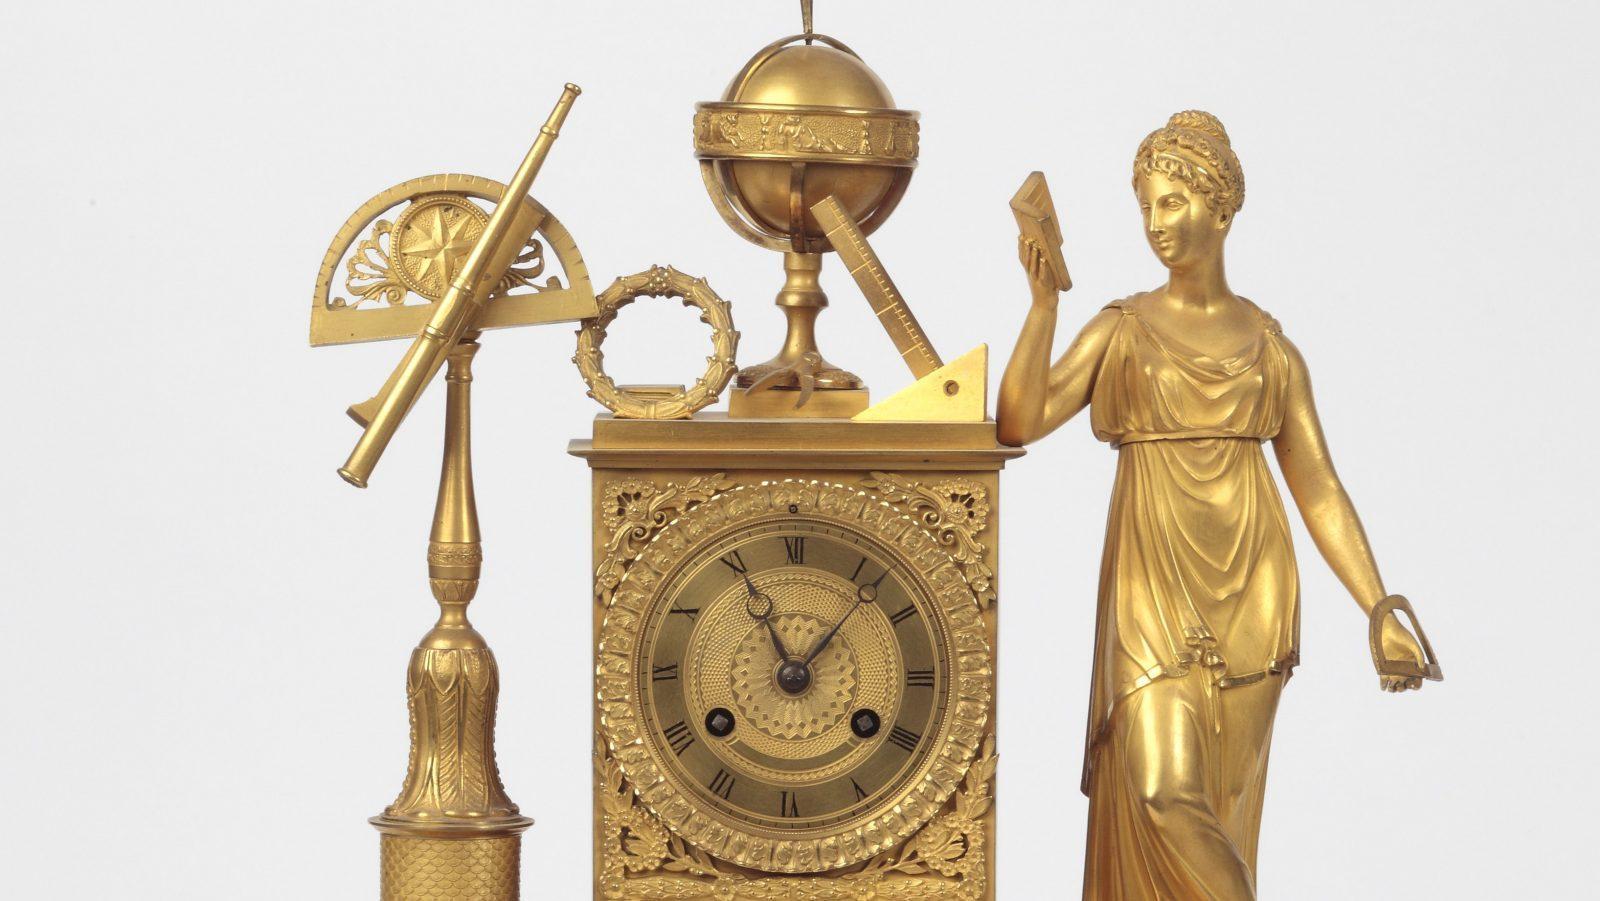 C3 - Reloj astronómico del siglo XVIII